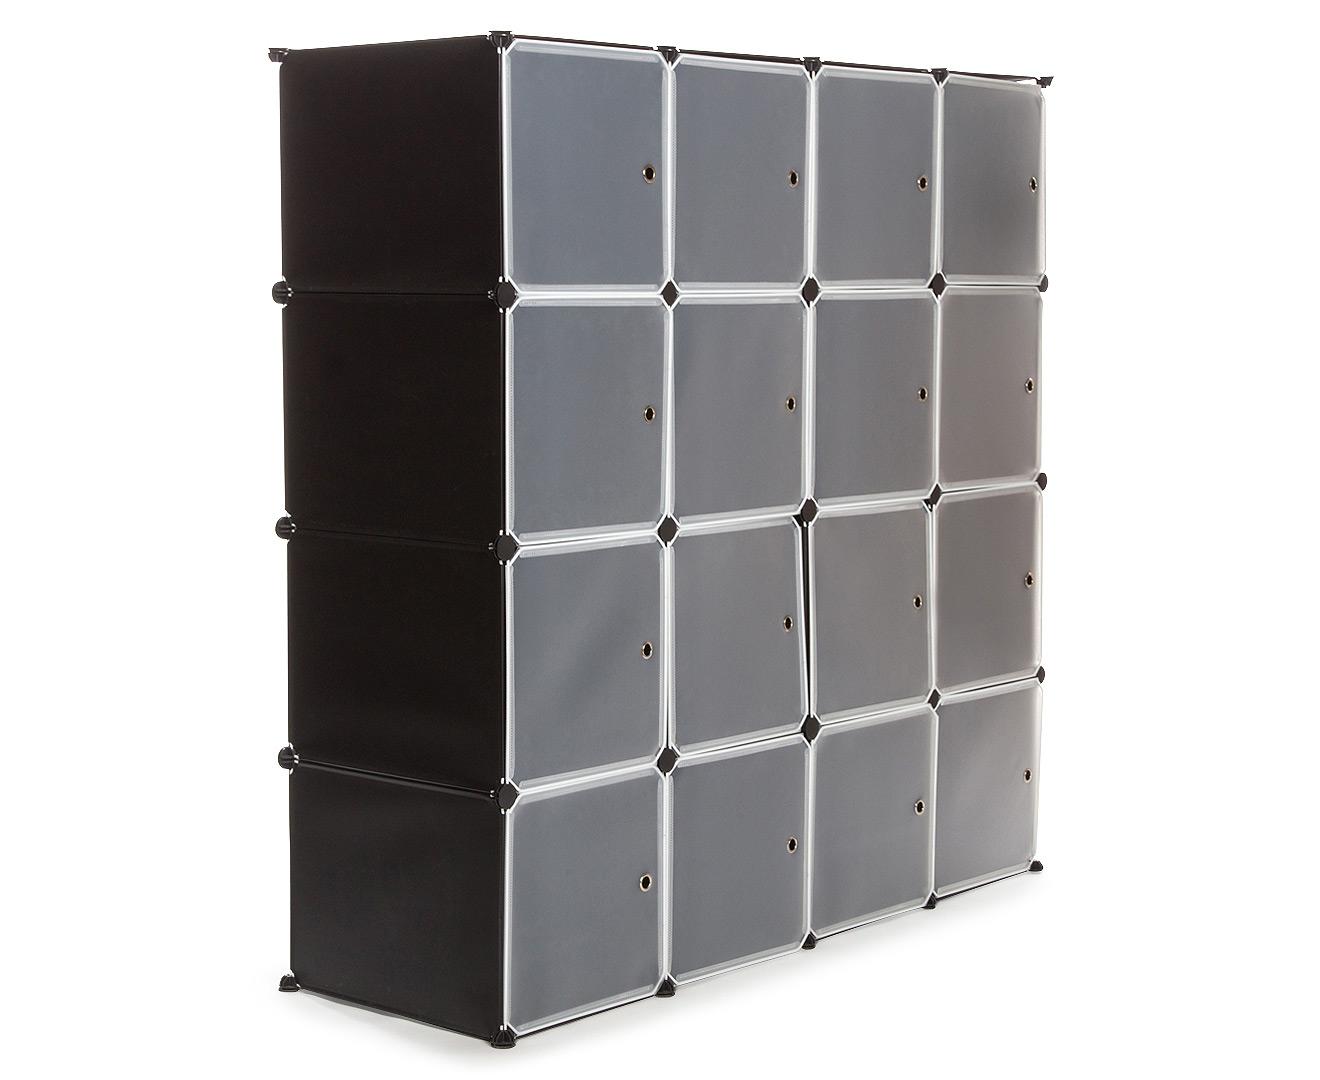 Modular 16 Compartment Storage Unit Black Great Daily  sc 1 st  Listitdallas & Daily Storage Units - Listitdallas